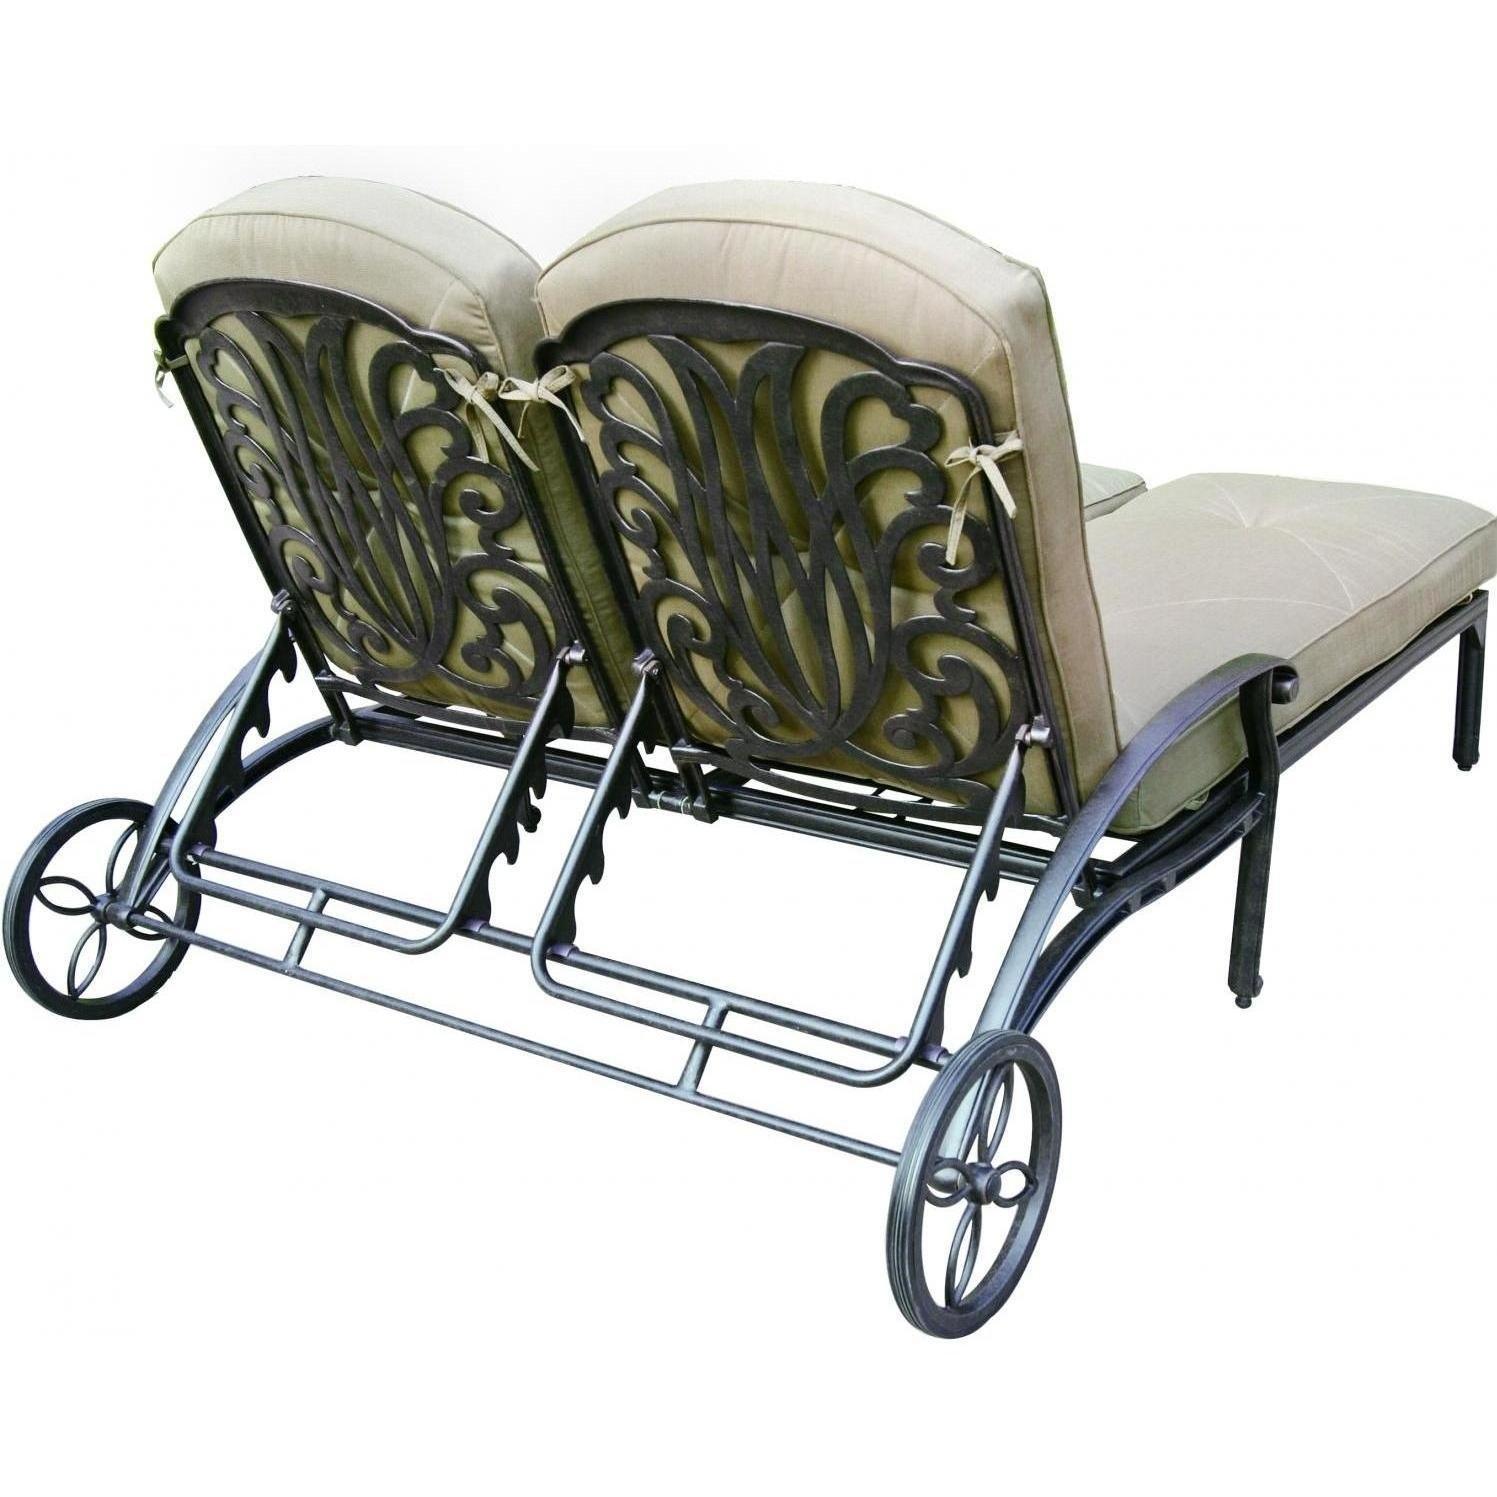 K B PATIO LD777-99 Elizabeth Double Chaise Lounge with Cushion, Antique Bronze